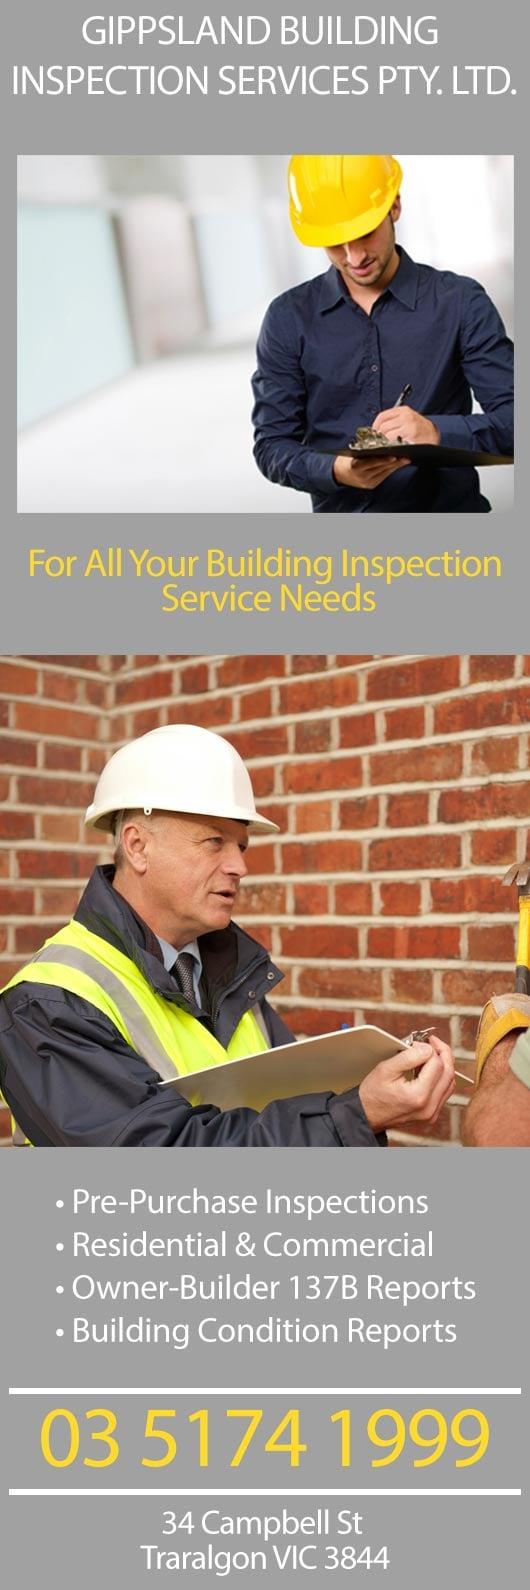 Building Inspection Services : Gippsland building inspection services pty ltd